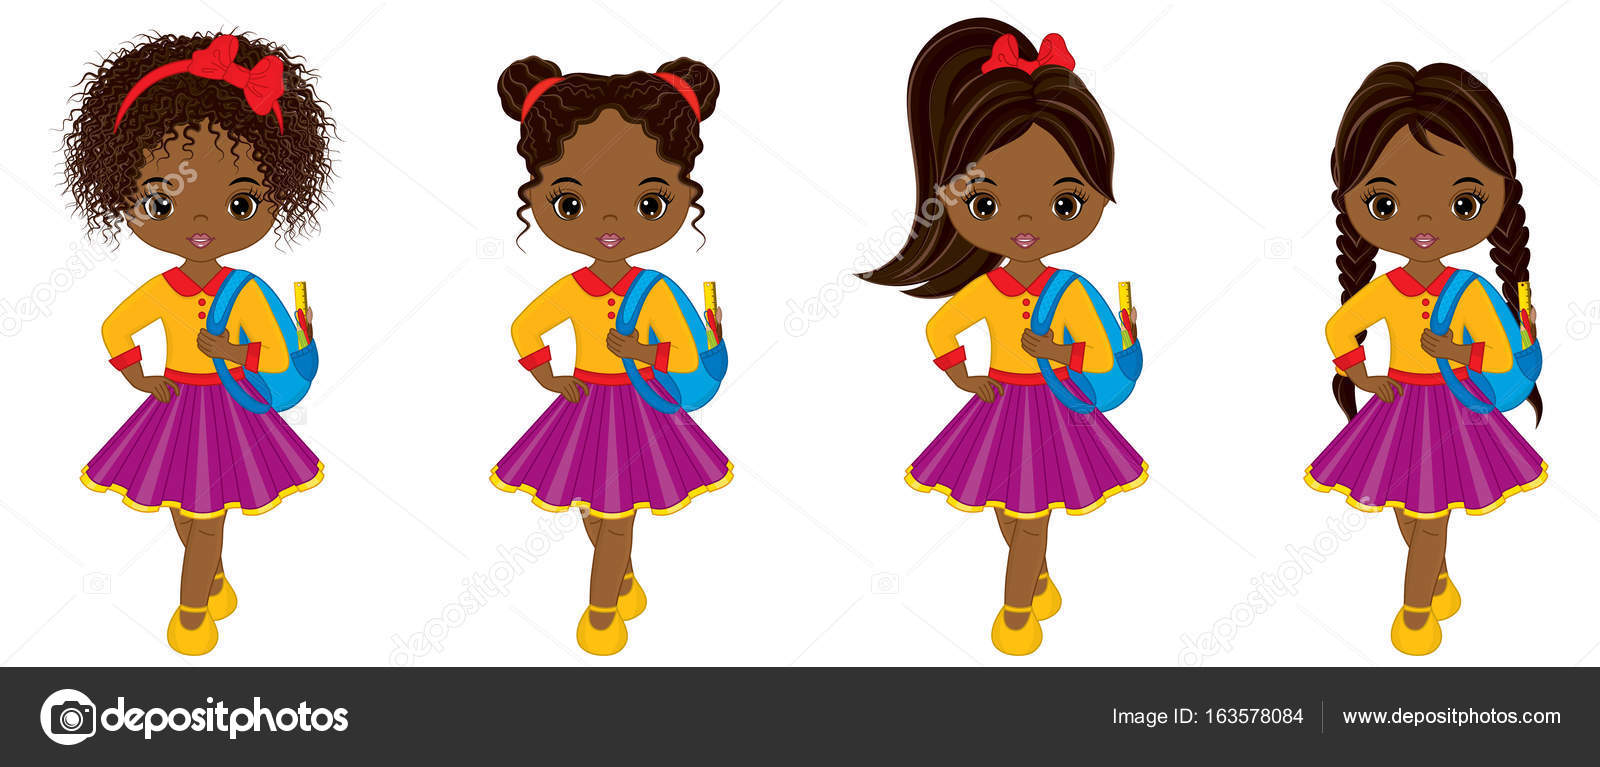 Cute little black girl hairstyles for school | Vector Cute ...